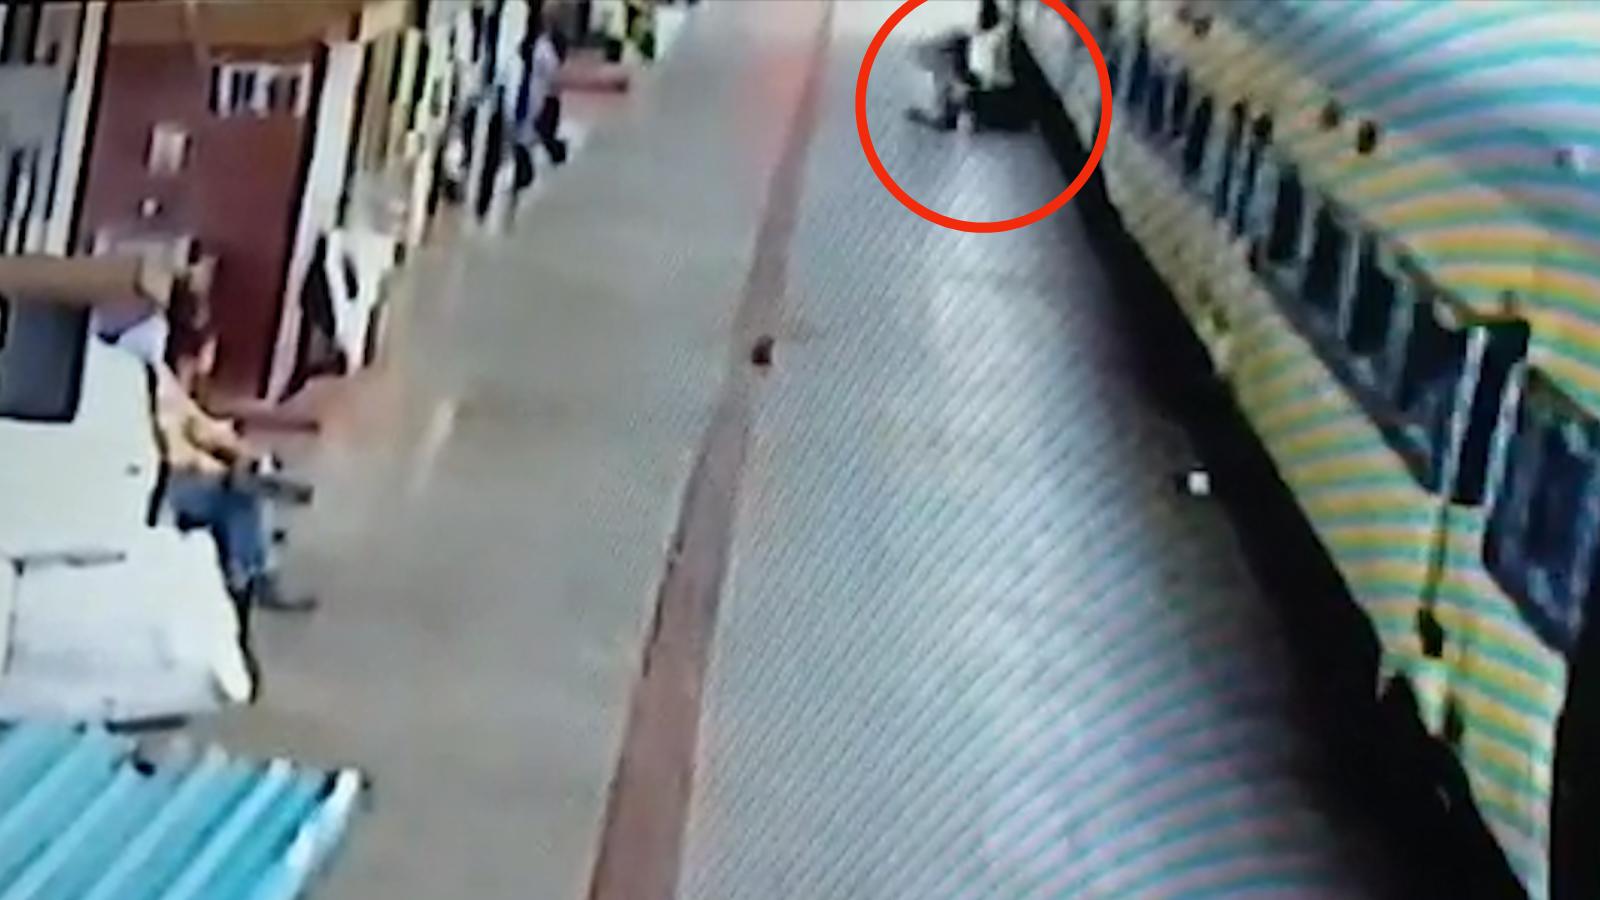 on-cam-rpf-cop-saves-passengers-life-at-bhubaneswar-station